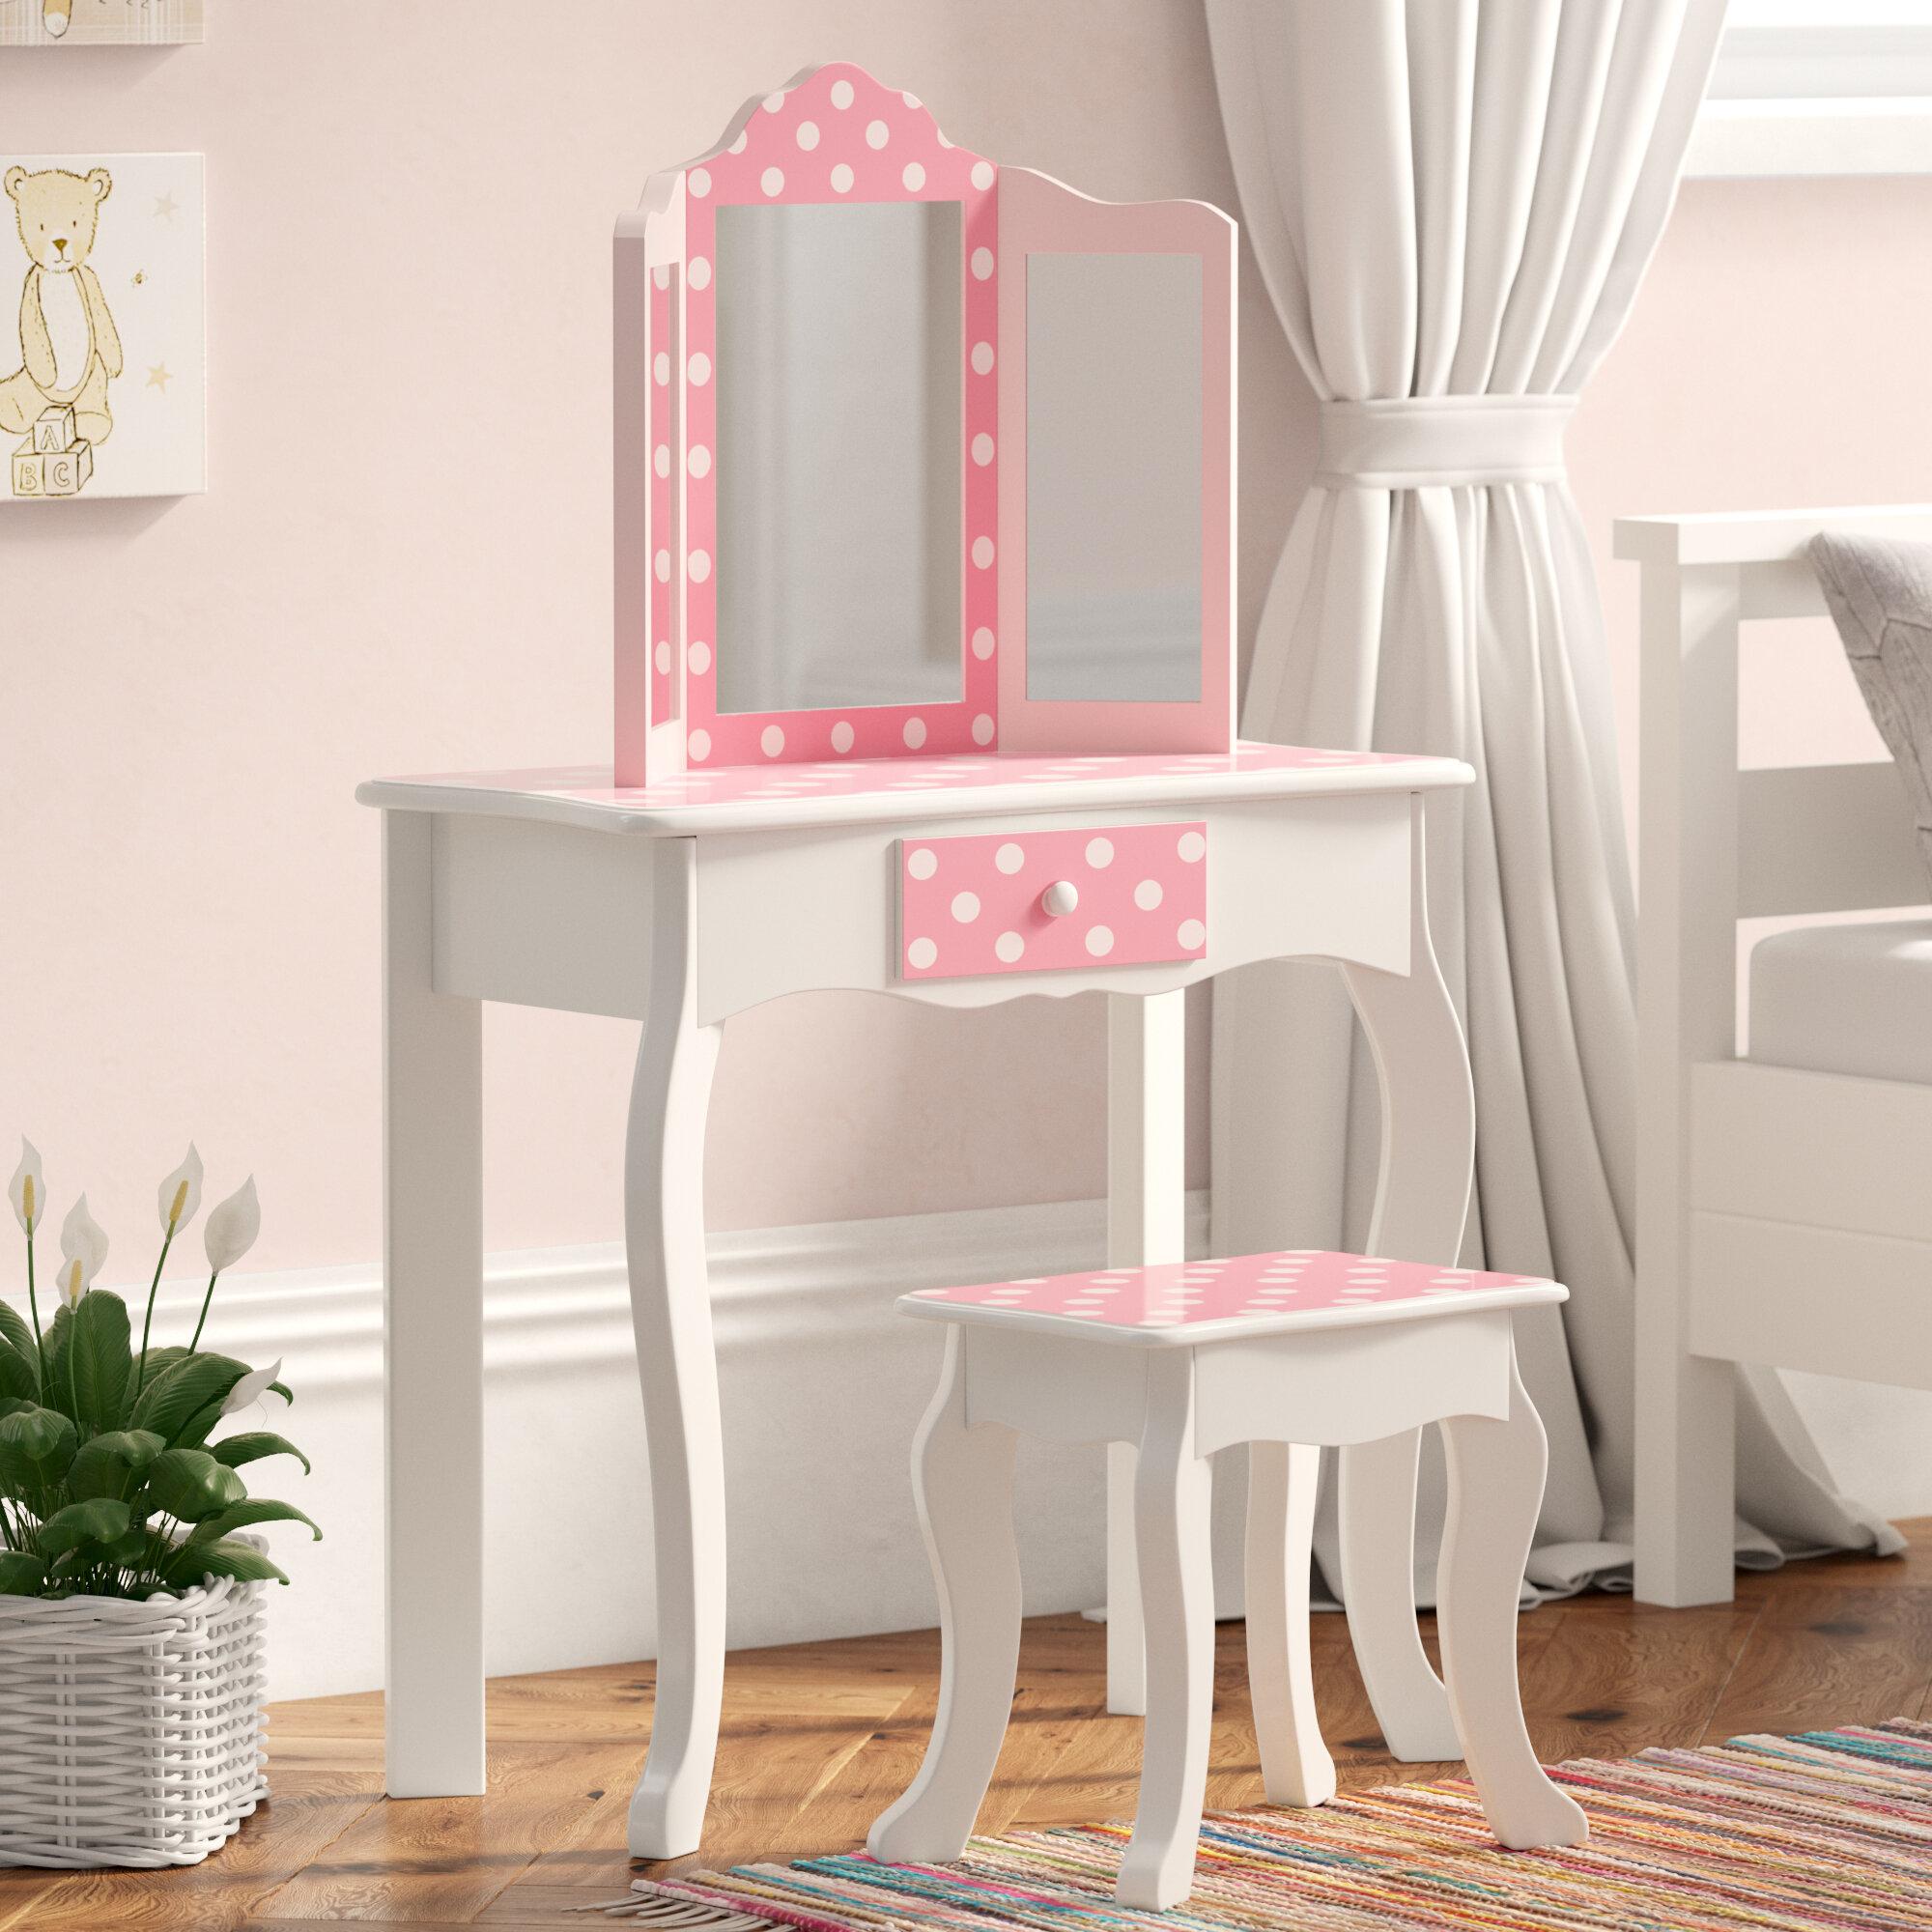 Kadence Childrens Wooden Vanity Dressing Table Mirror Stool Set